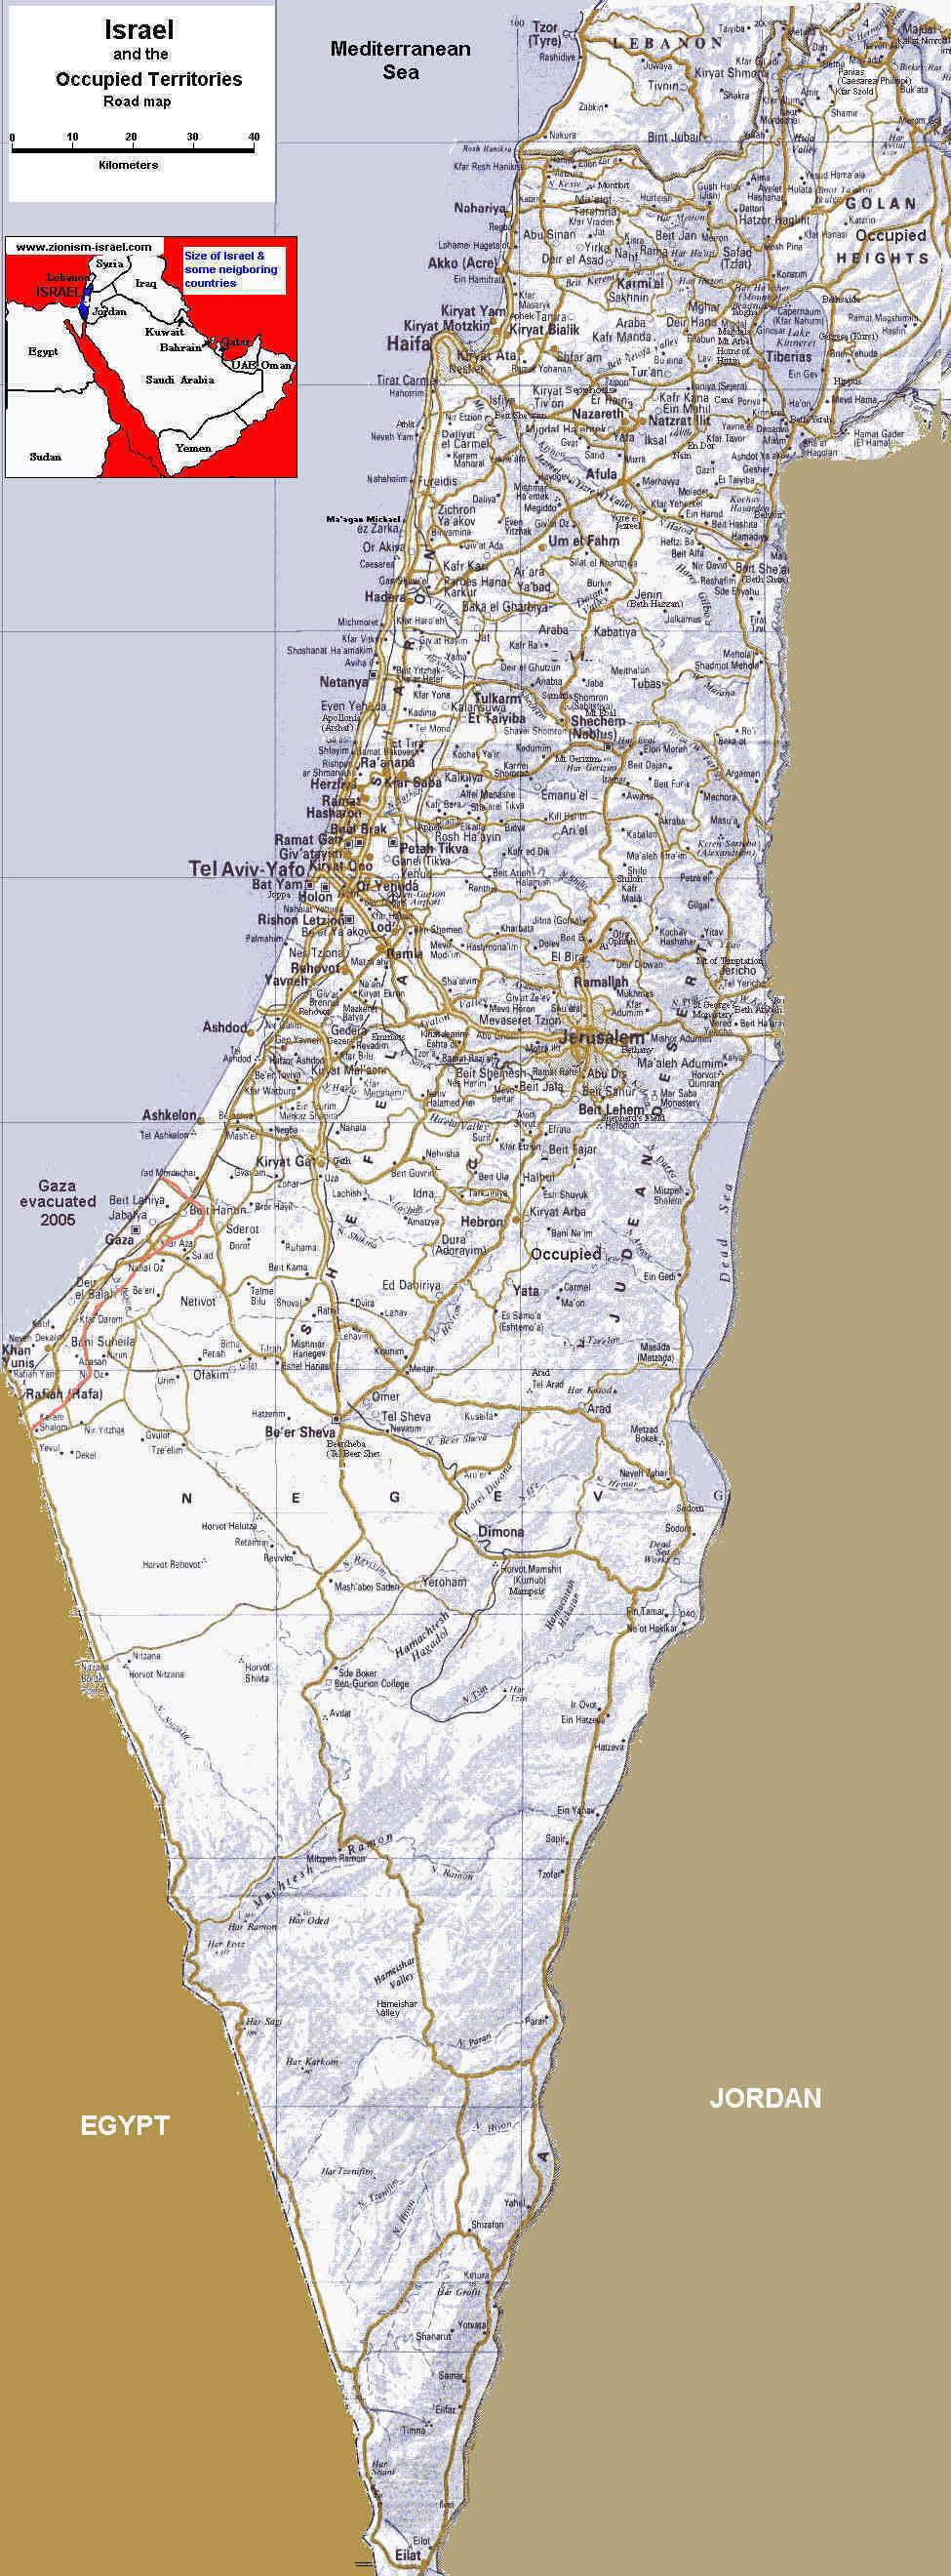 carte detaillee israel - Photo